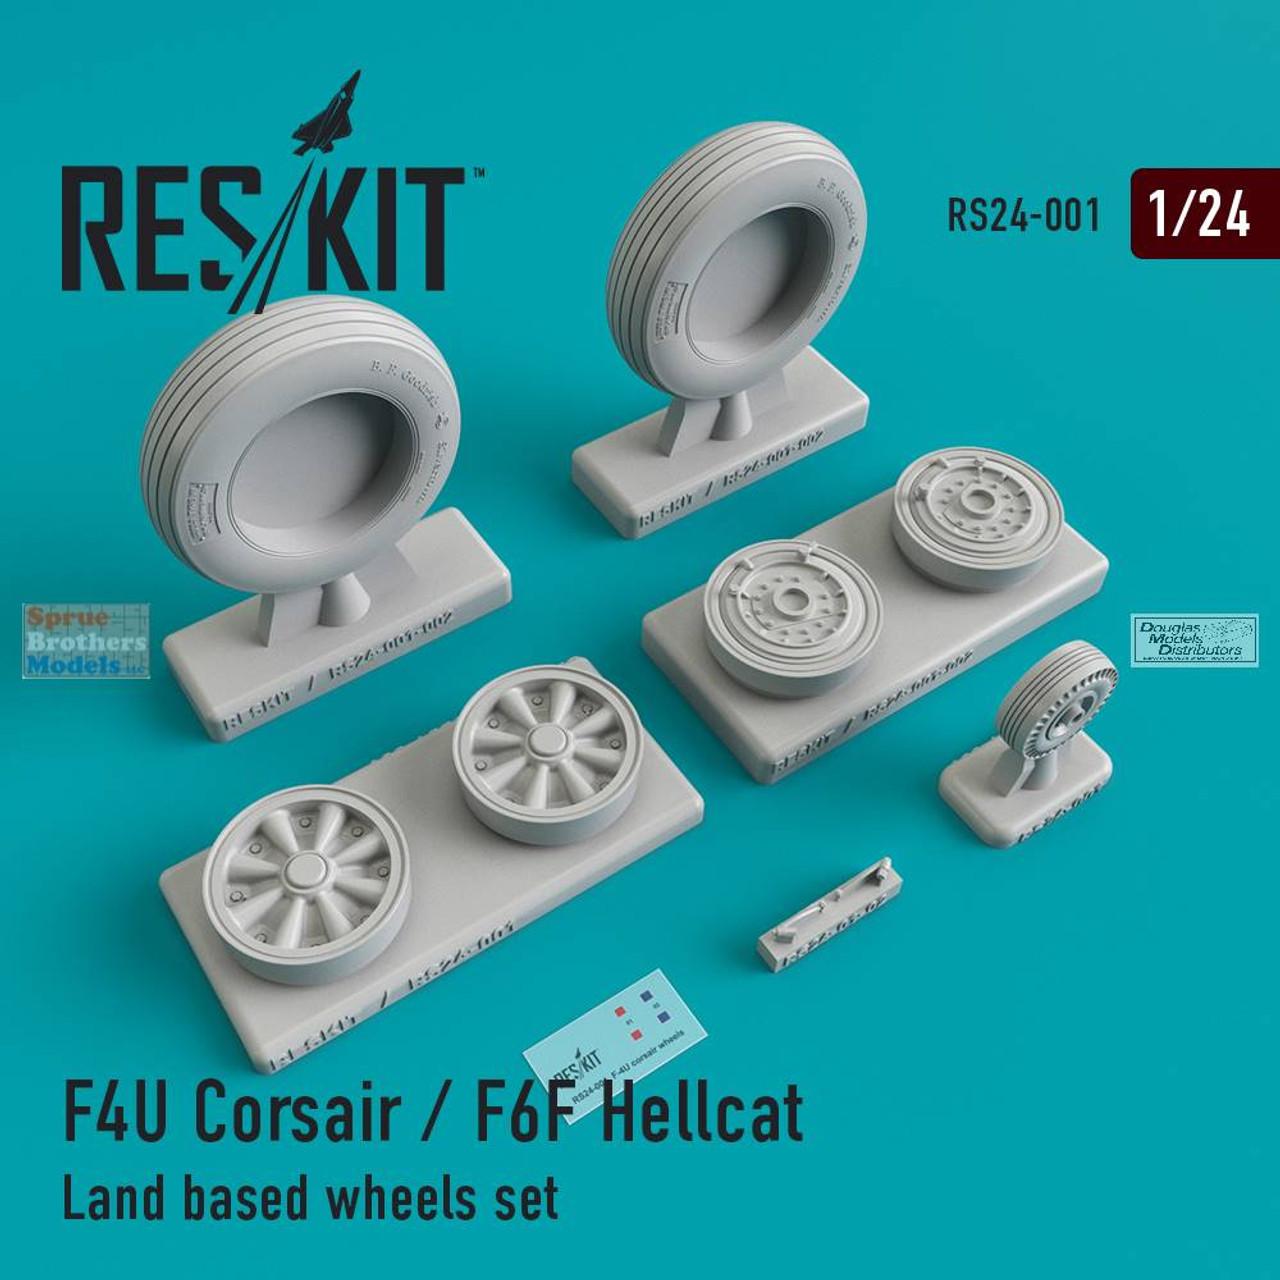 RESRS240001 1:24 ResKit F4U Corsair / F6F Hellcat Land-Based Wheels Set